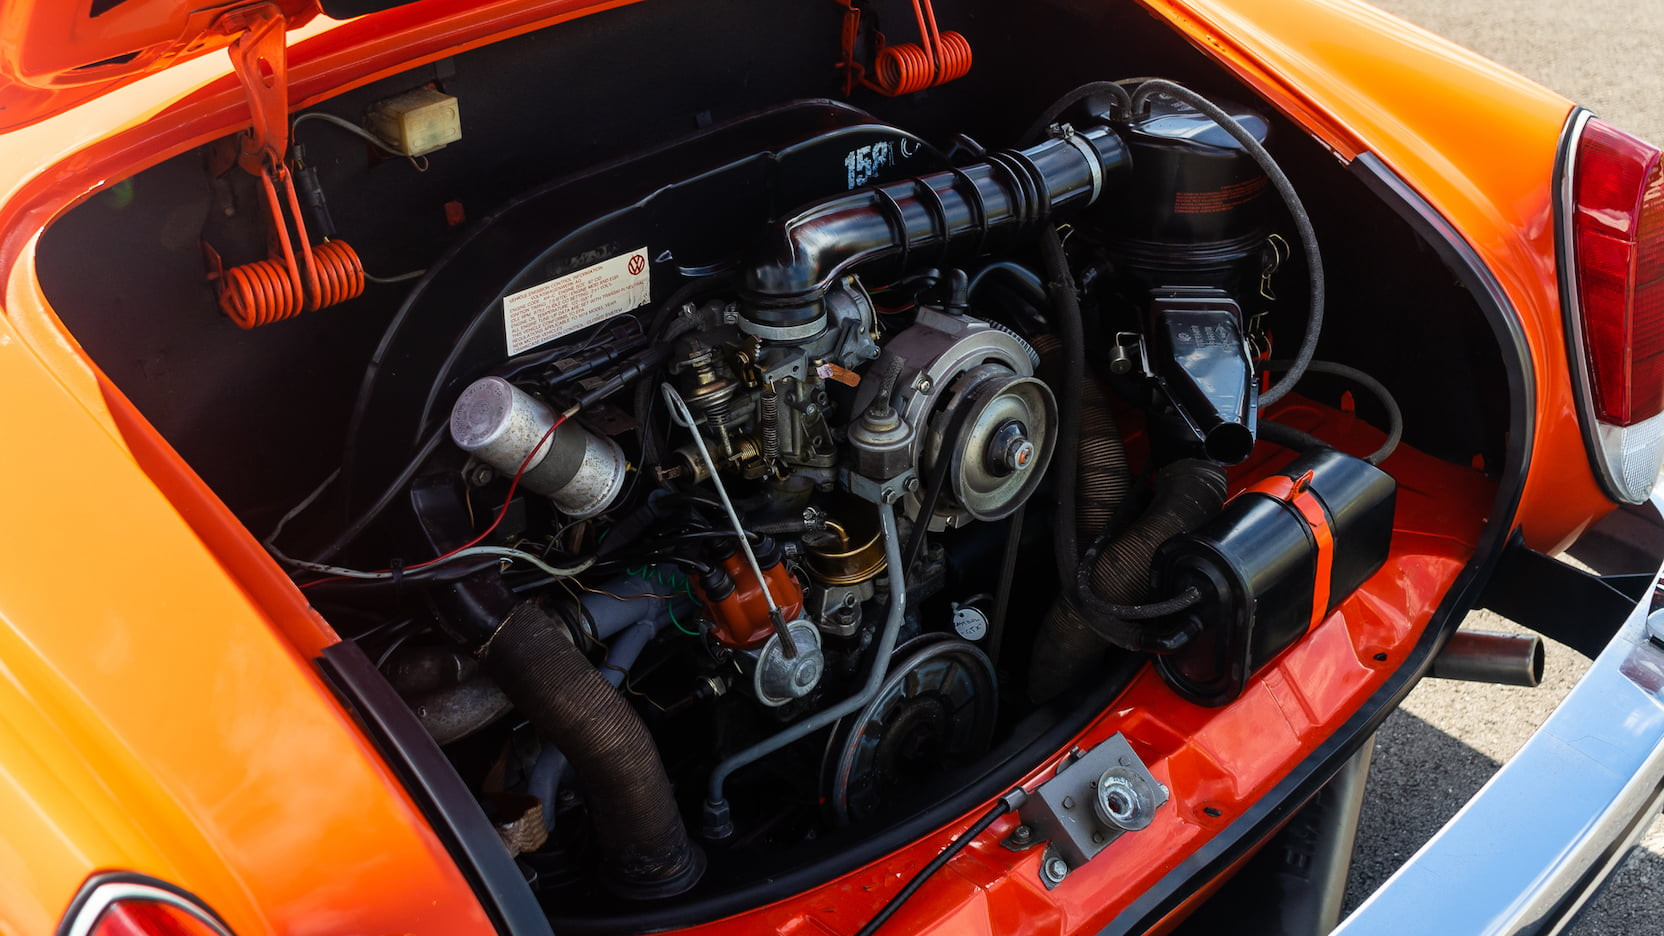 1974 Karmann Ghia engine